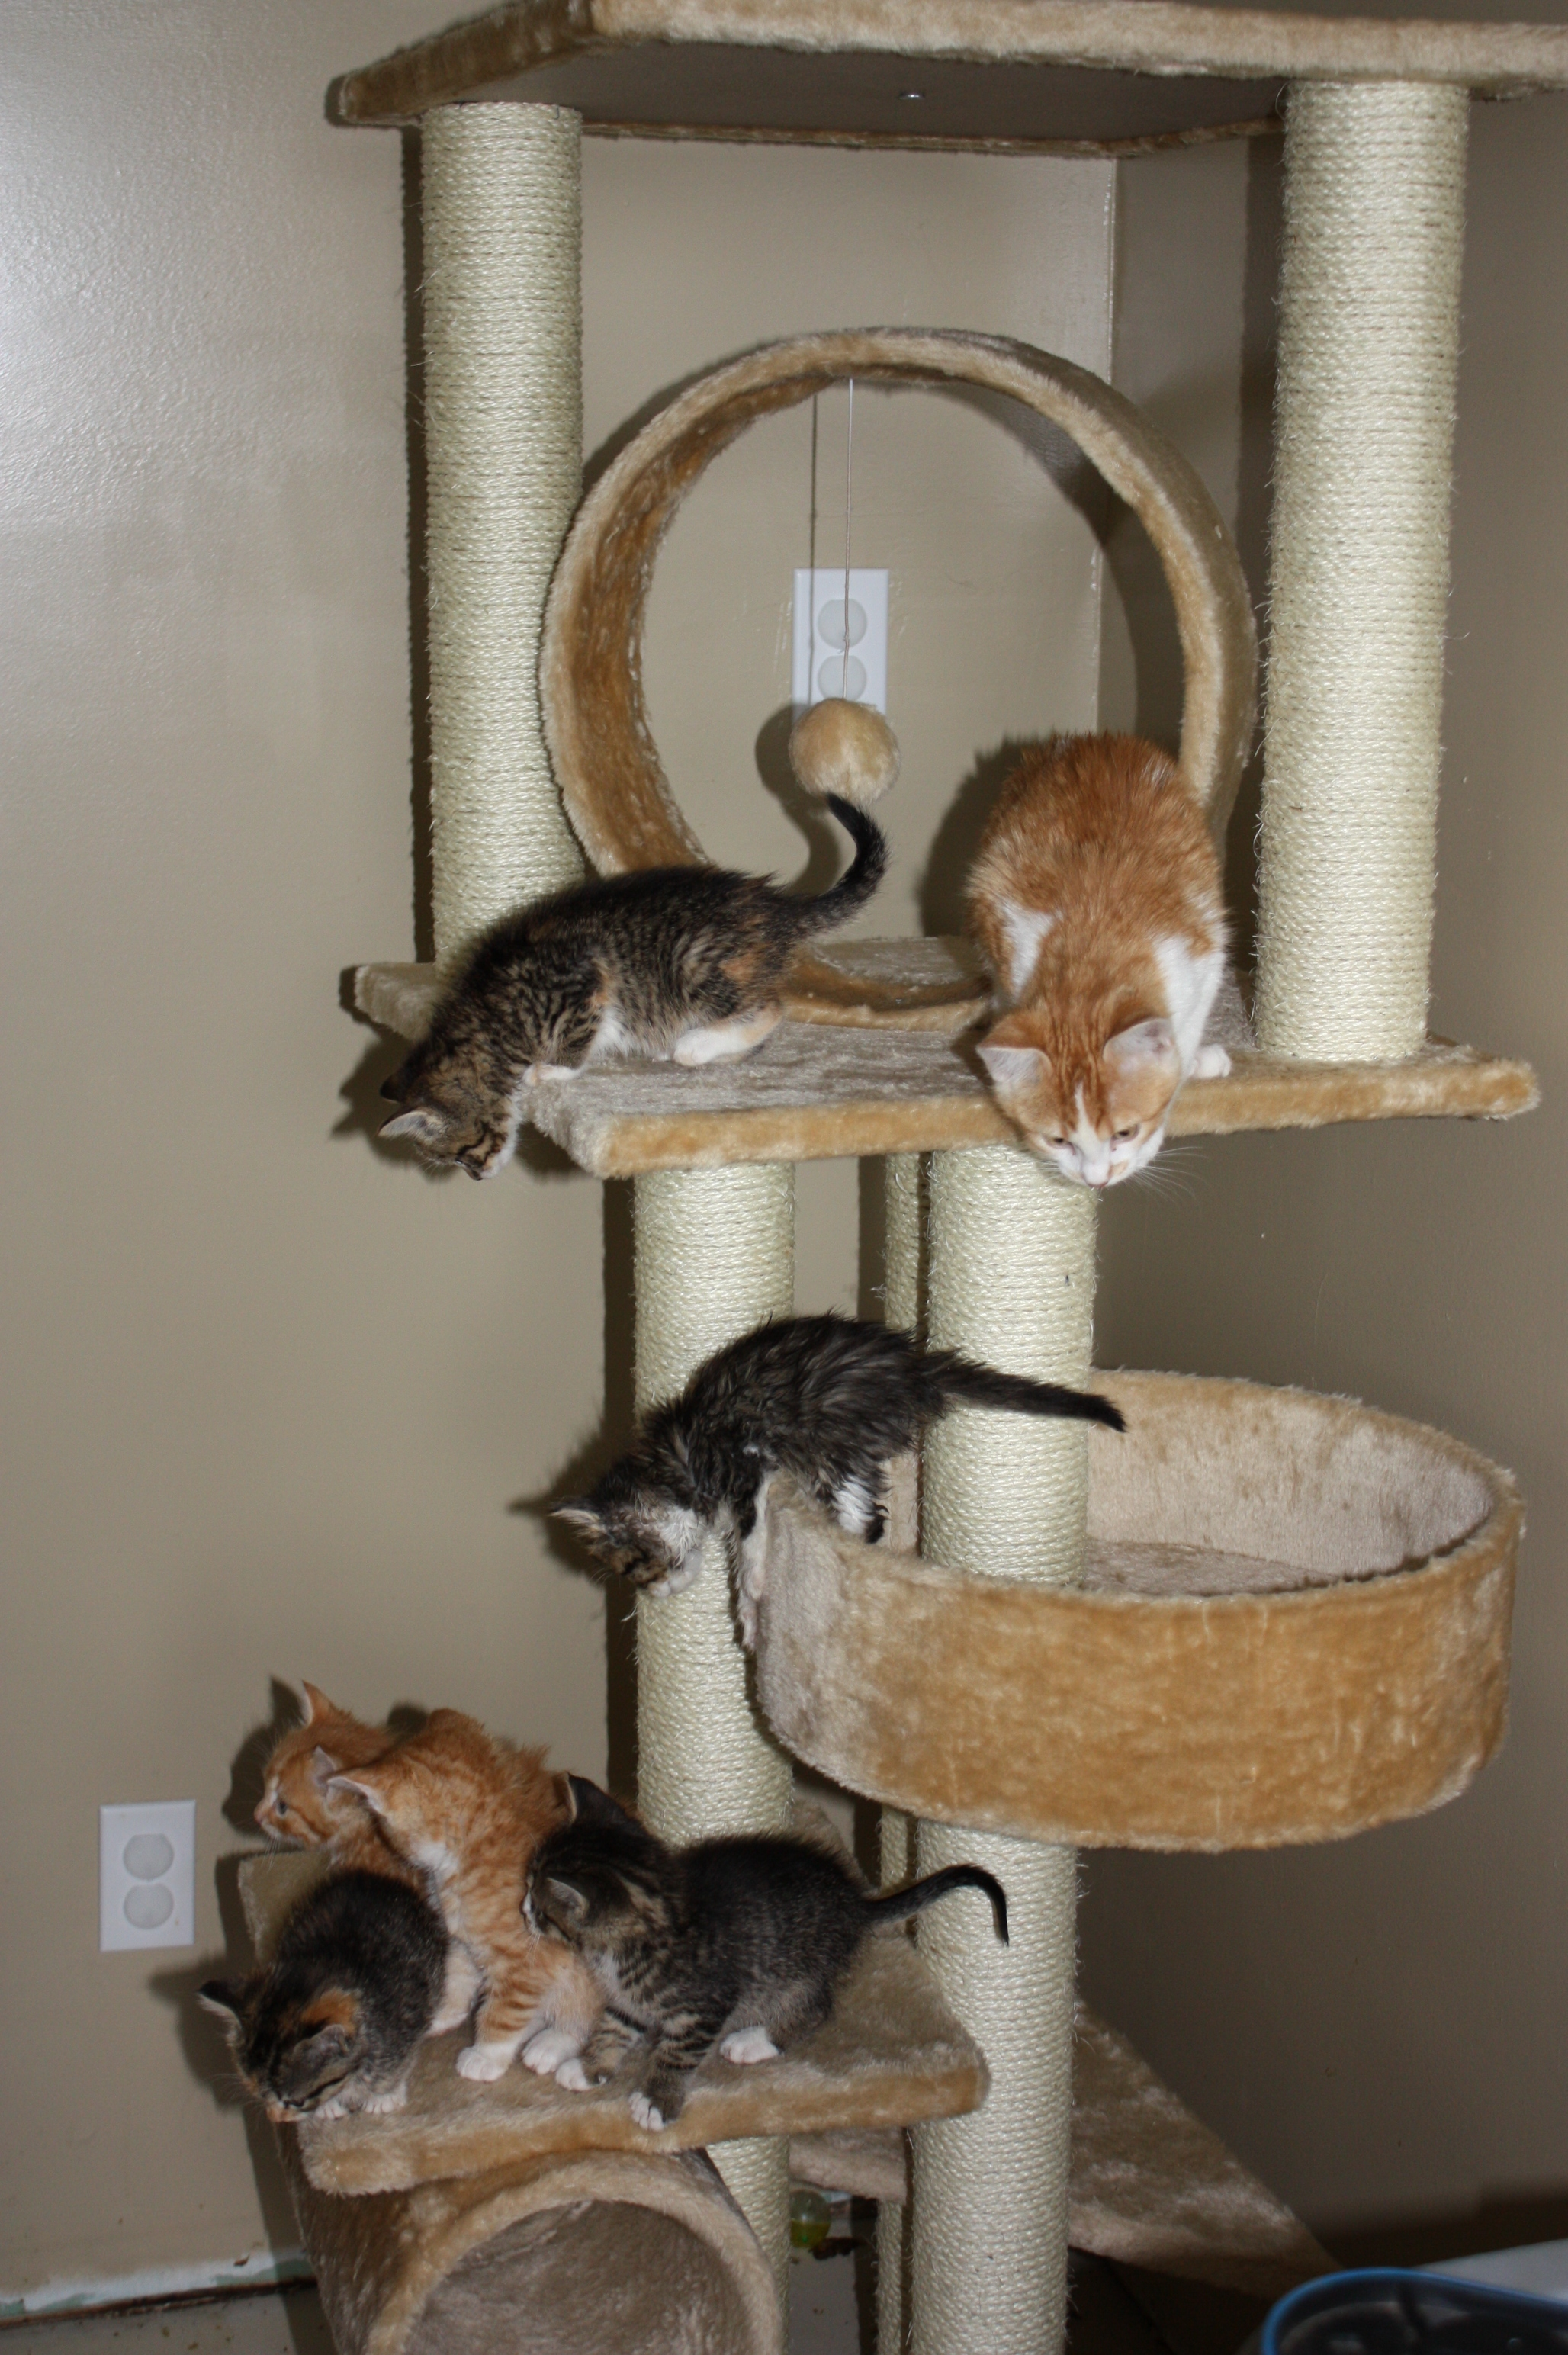 KittensOnTower_03